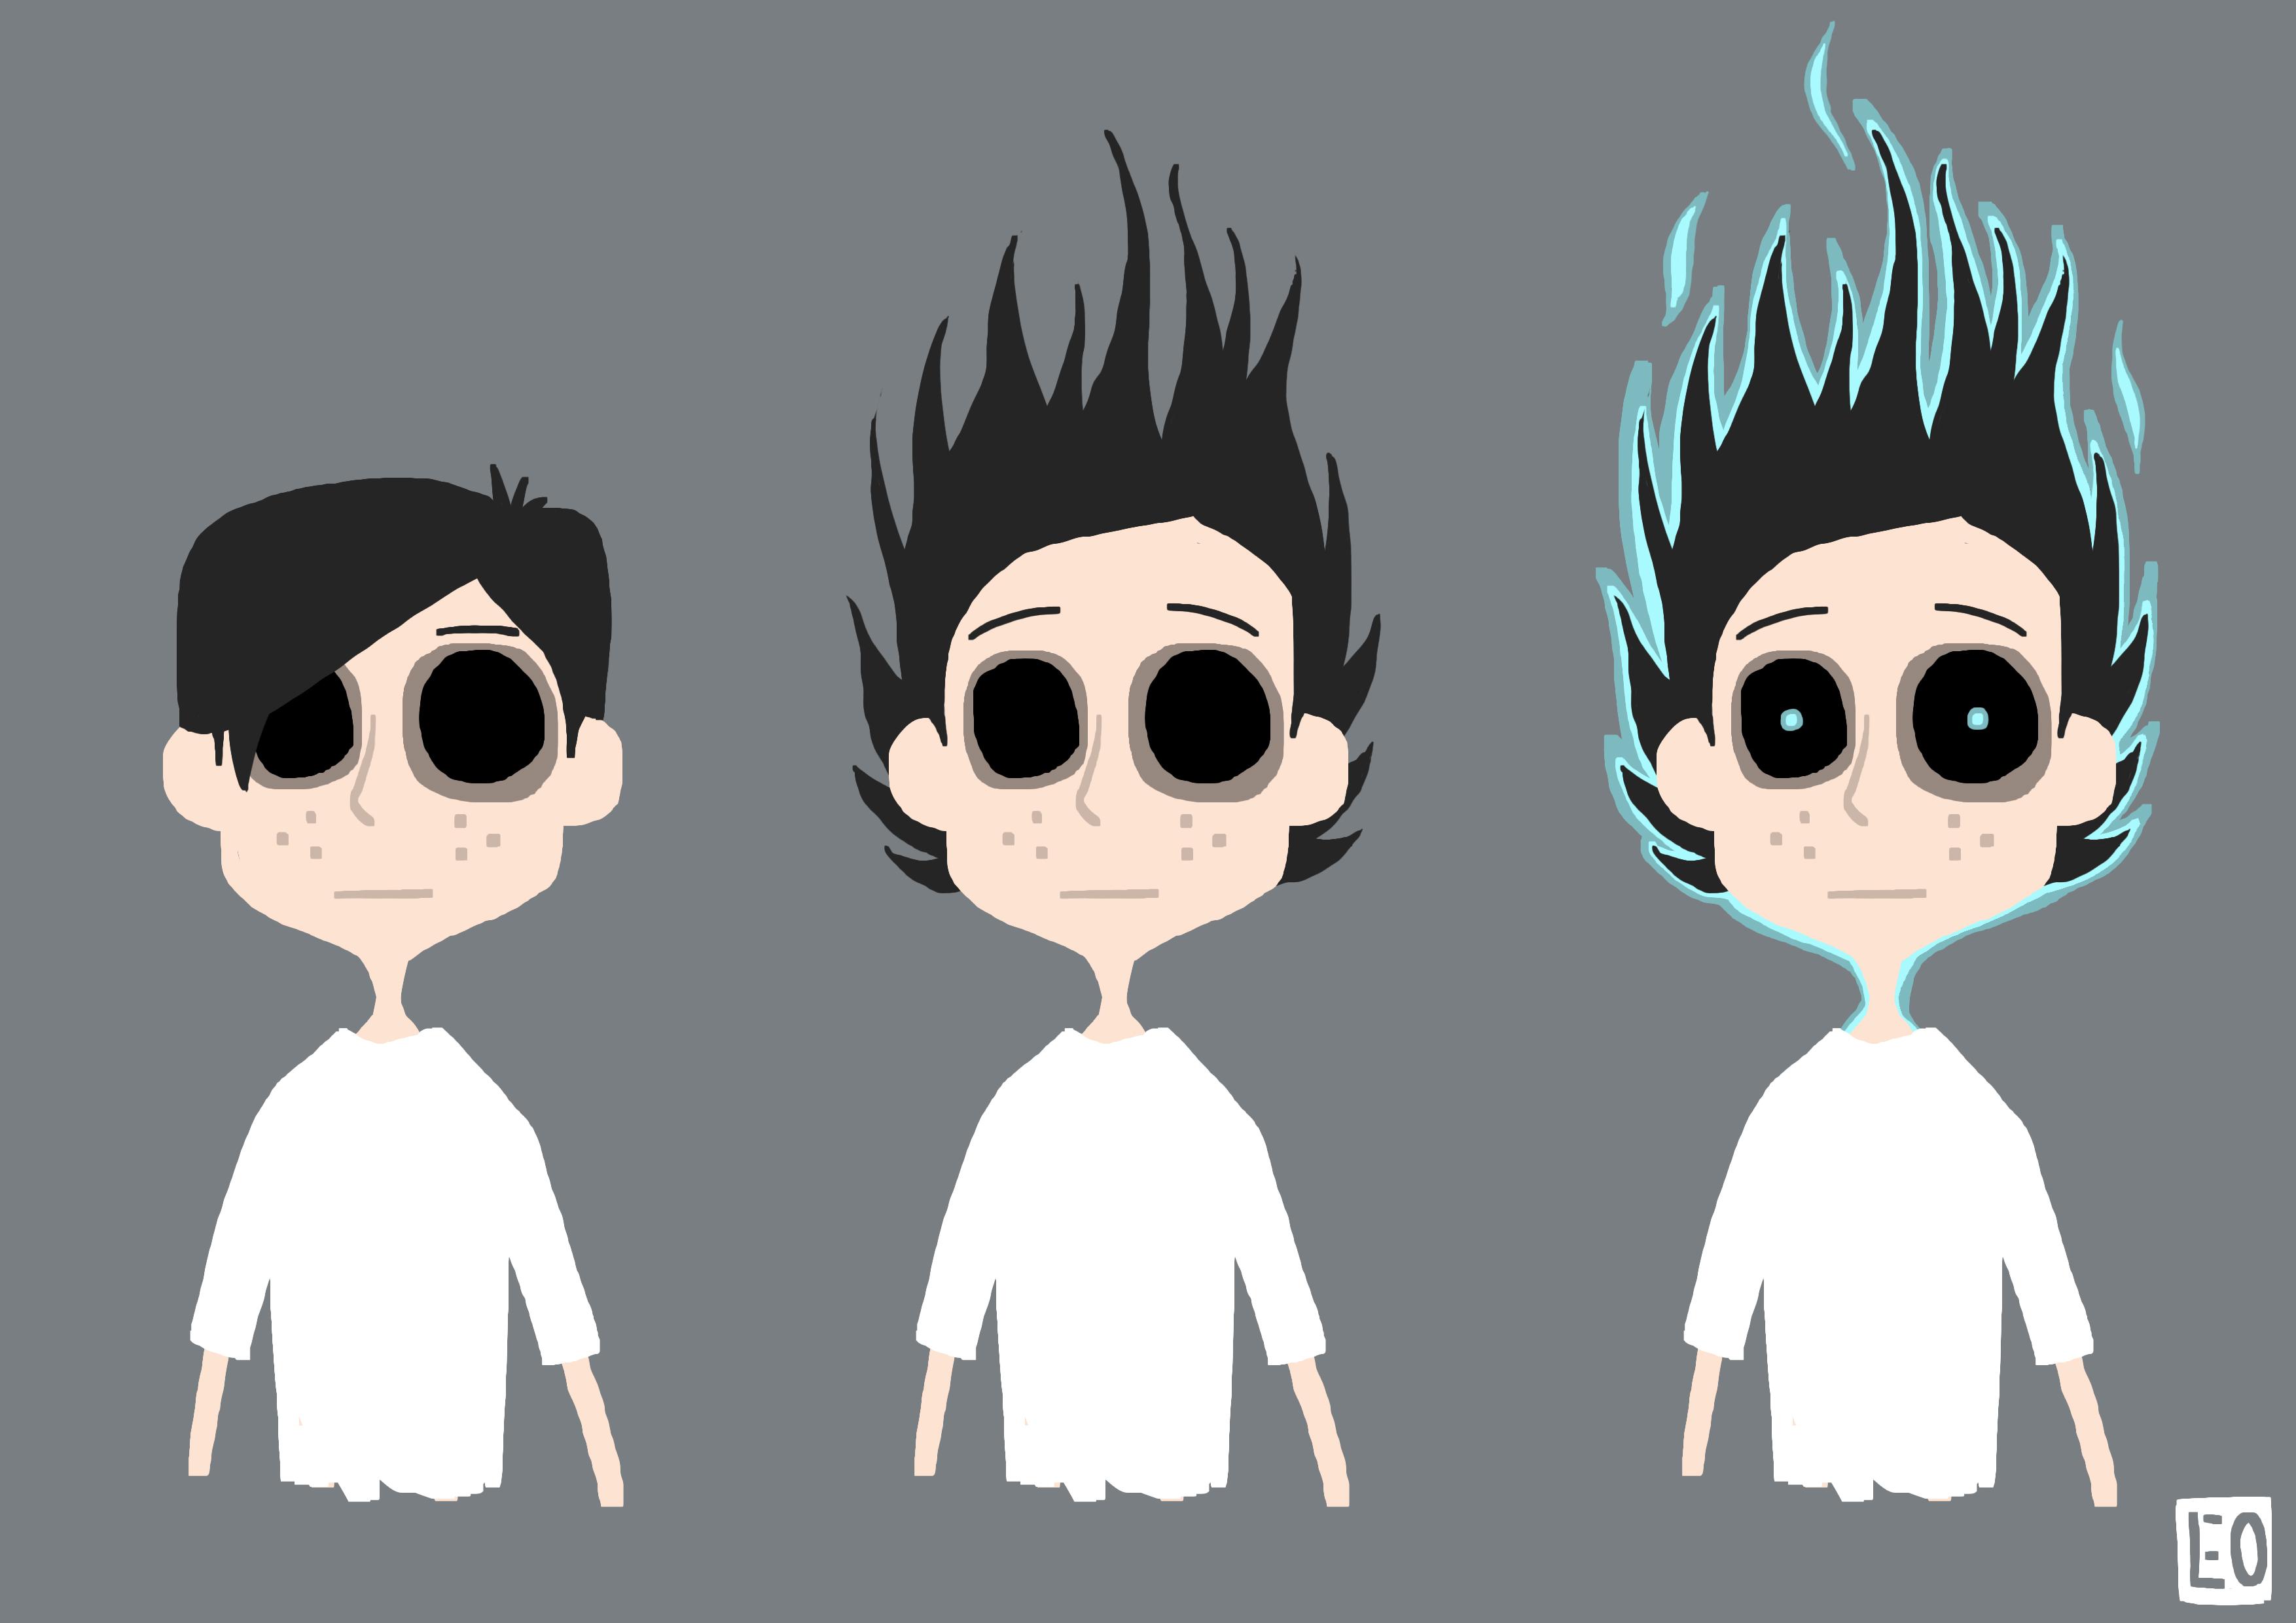 Bobby_03_Concept_Art